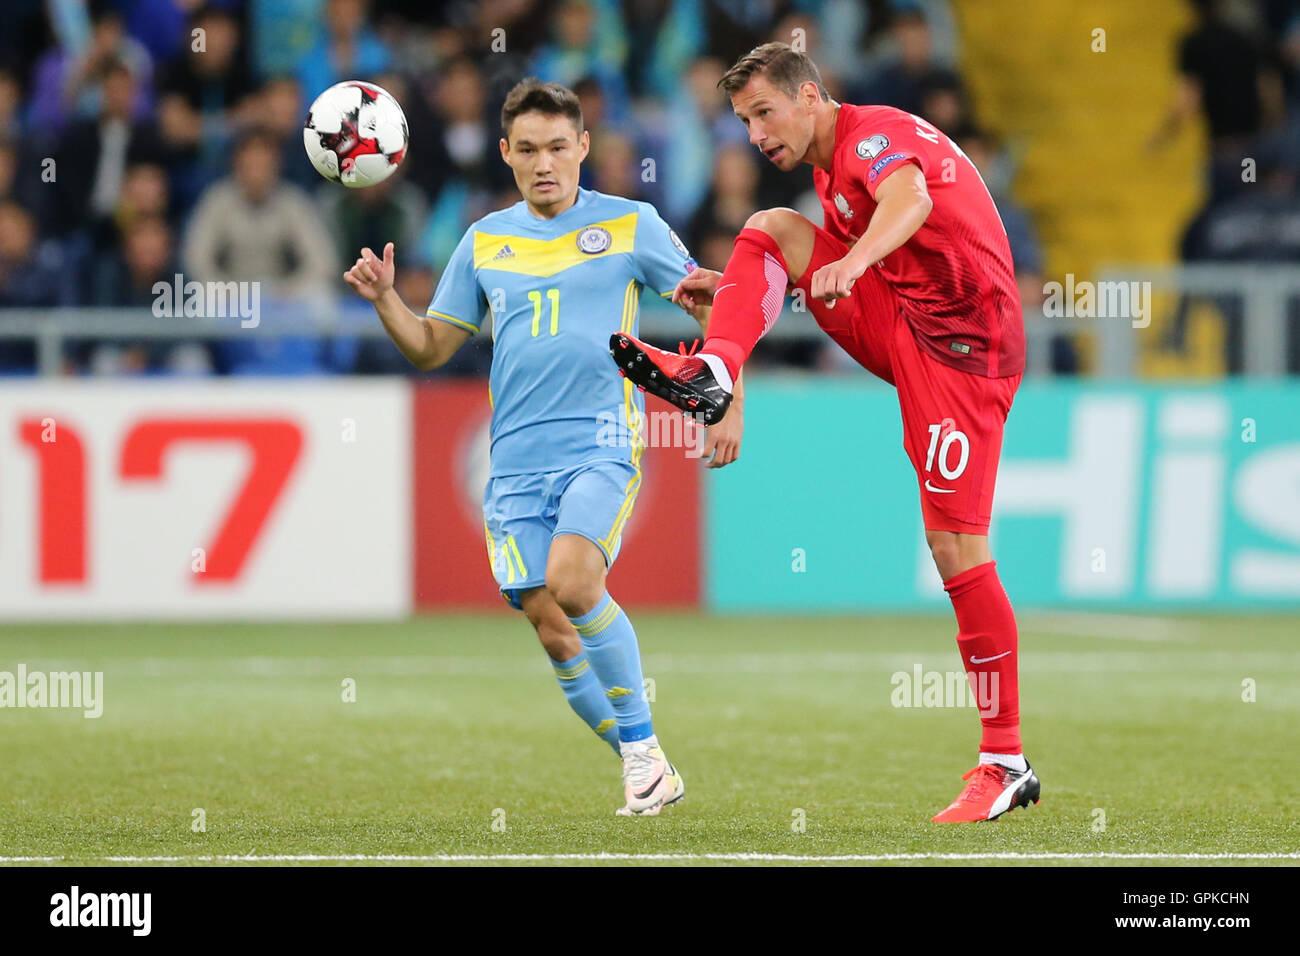 Astana, Kazakhstan. 4th September, 2016. Grzegorz Krychowiak (POL), Serikzhan Muzhikov (KAZ), Kazakhstan versus Poland, FIFA World Cup 2018 qualifier. The game ended in a 2-2 draw Credit:  Action Plus Sports Images/Alamy Live News Stock Photo